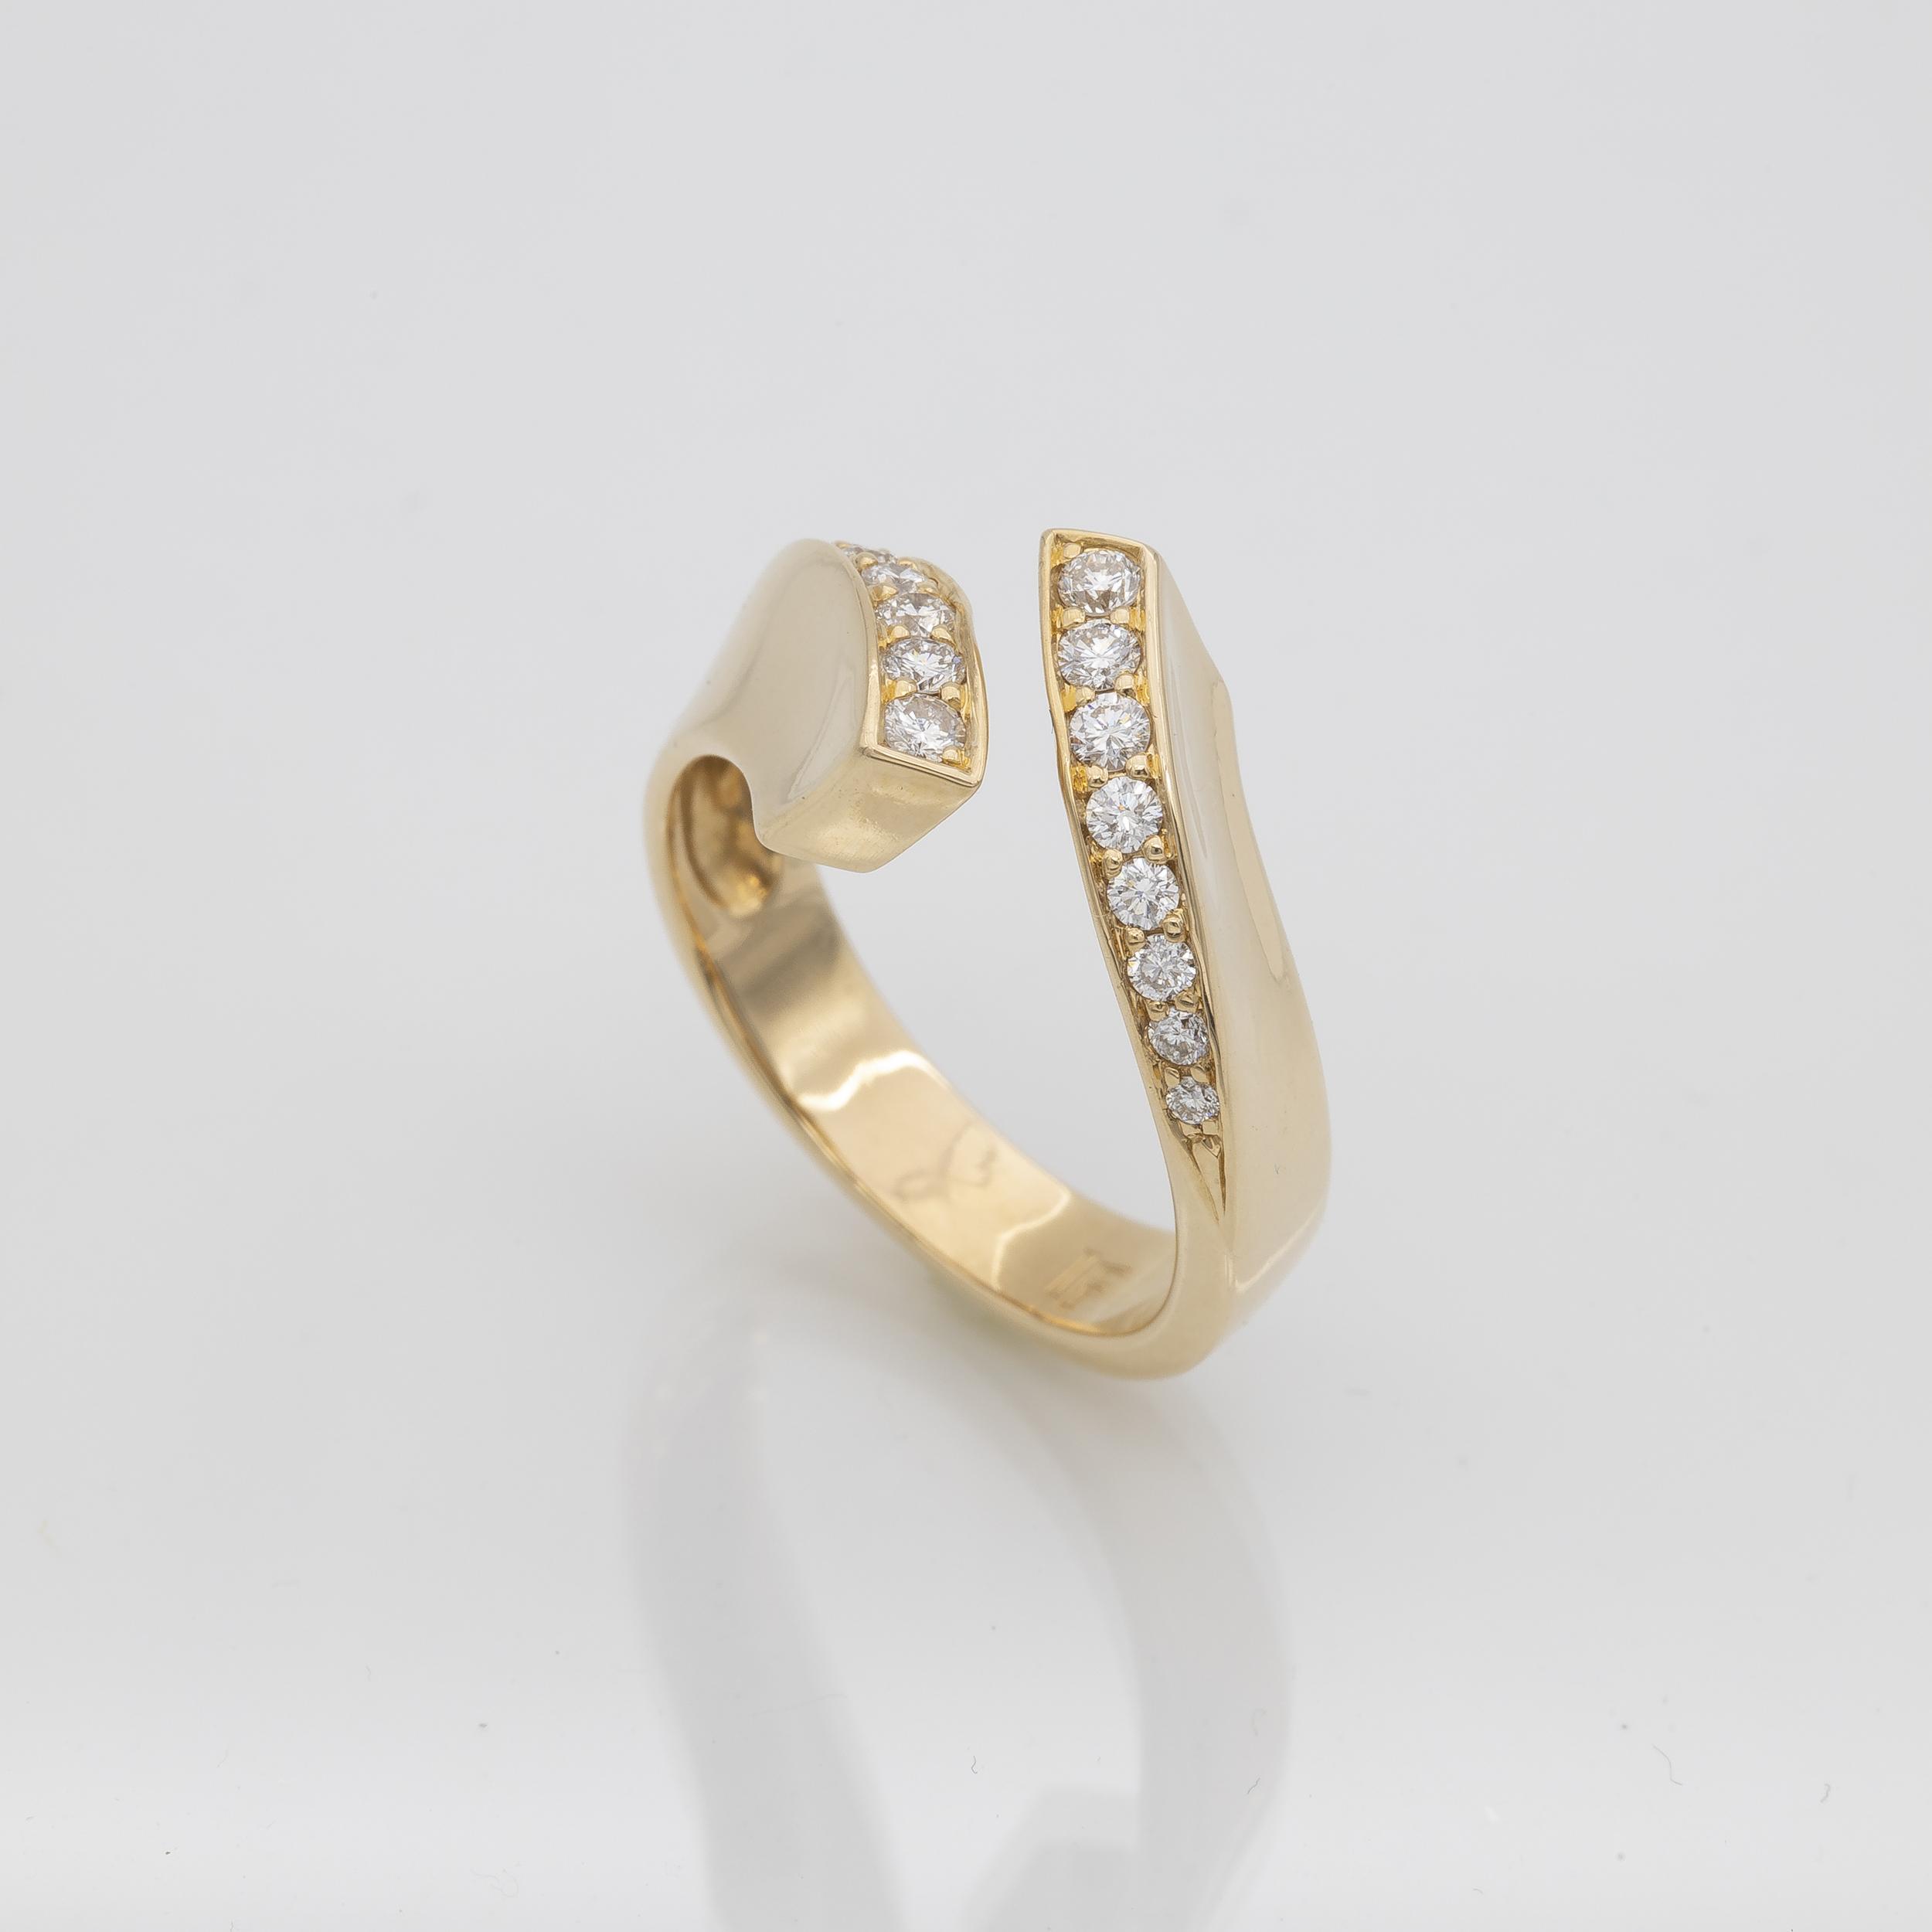 Bague vague or jaune serti de diamants